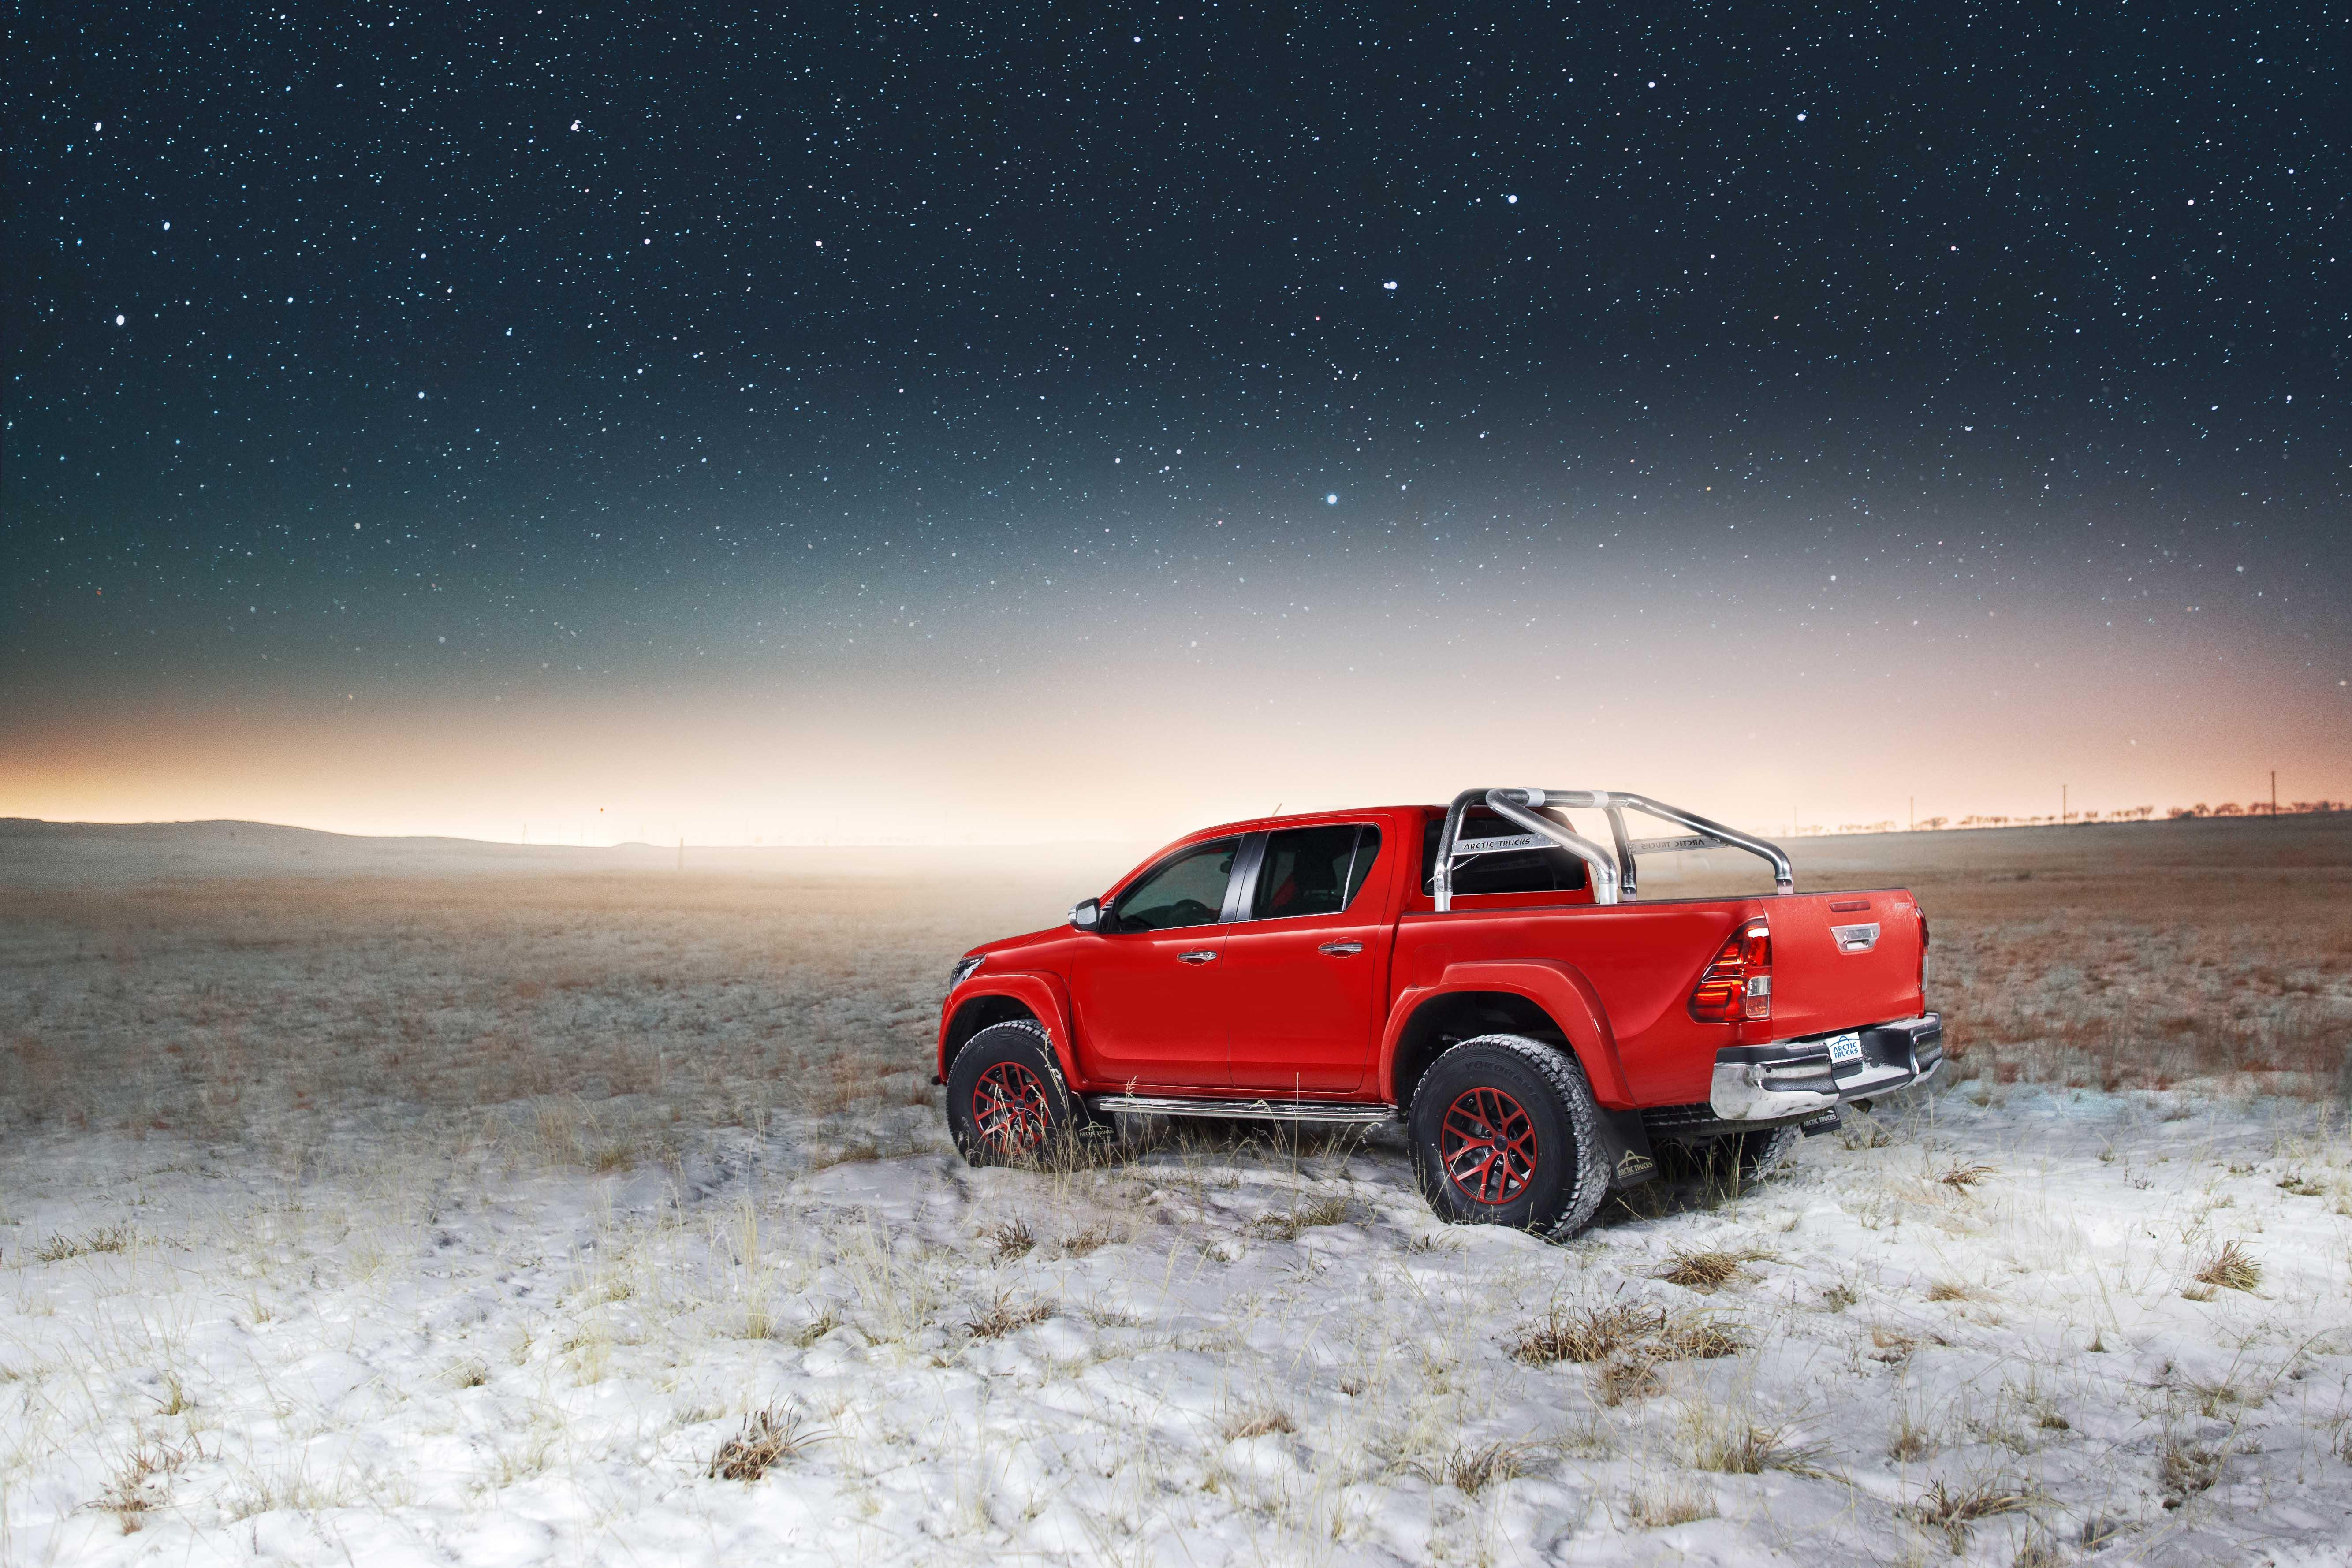 Toyota Hilux Arctic Trucks AT35 Rear Quarter Dusk.jpg